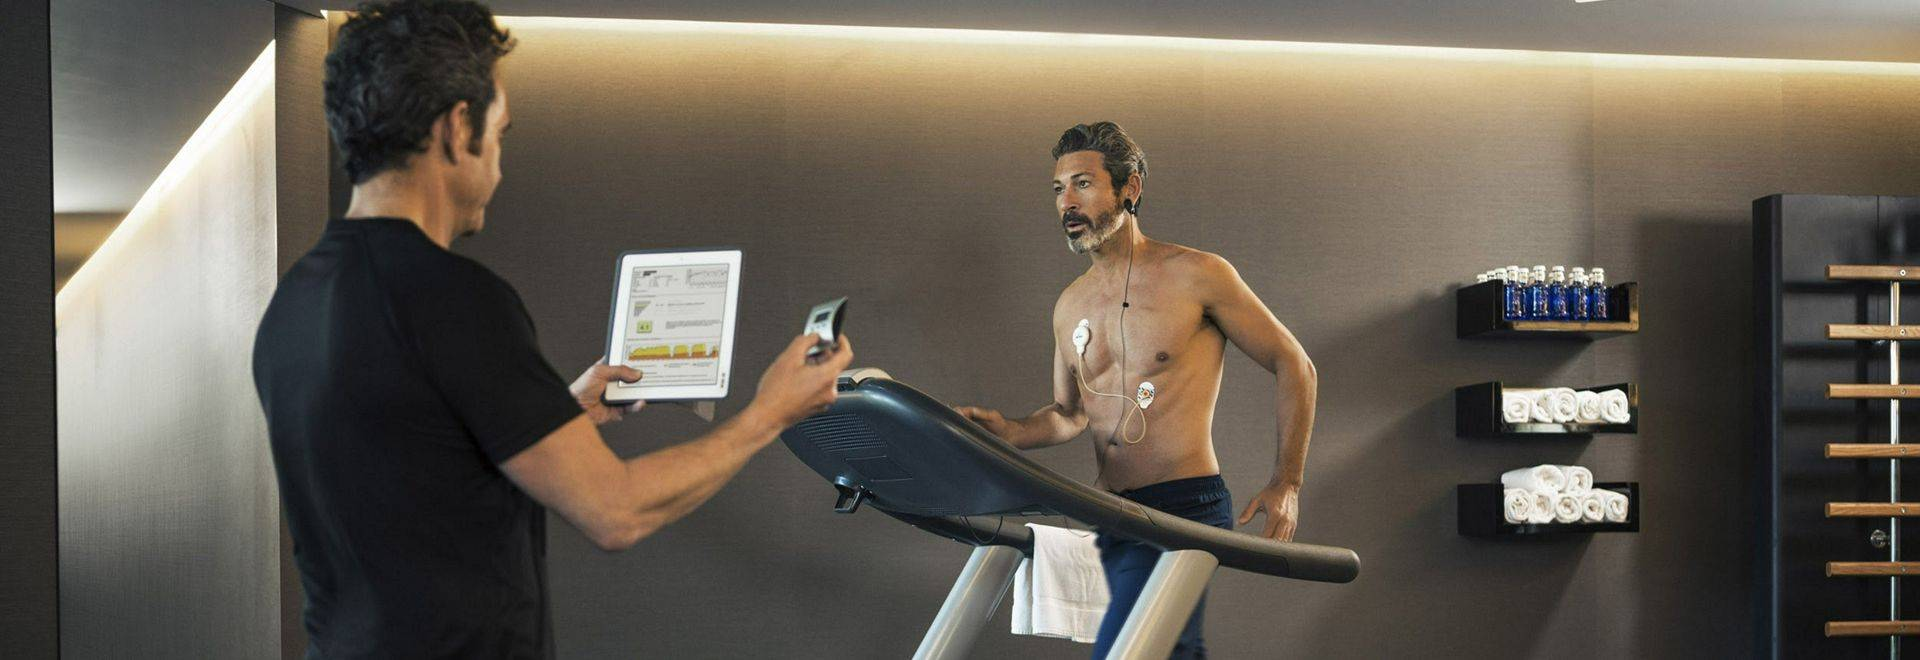 SHA-Wellness-Clinic-treadmill.jpg